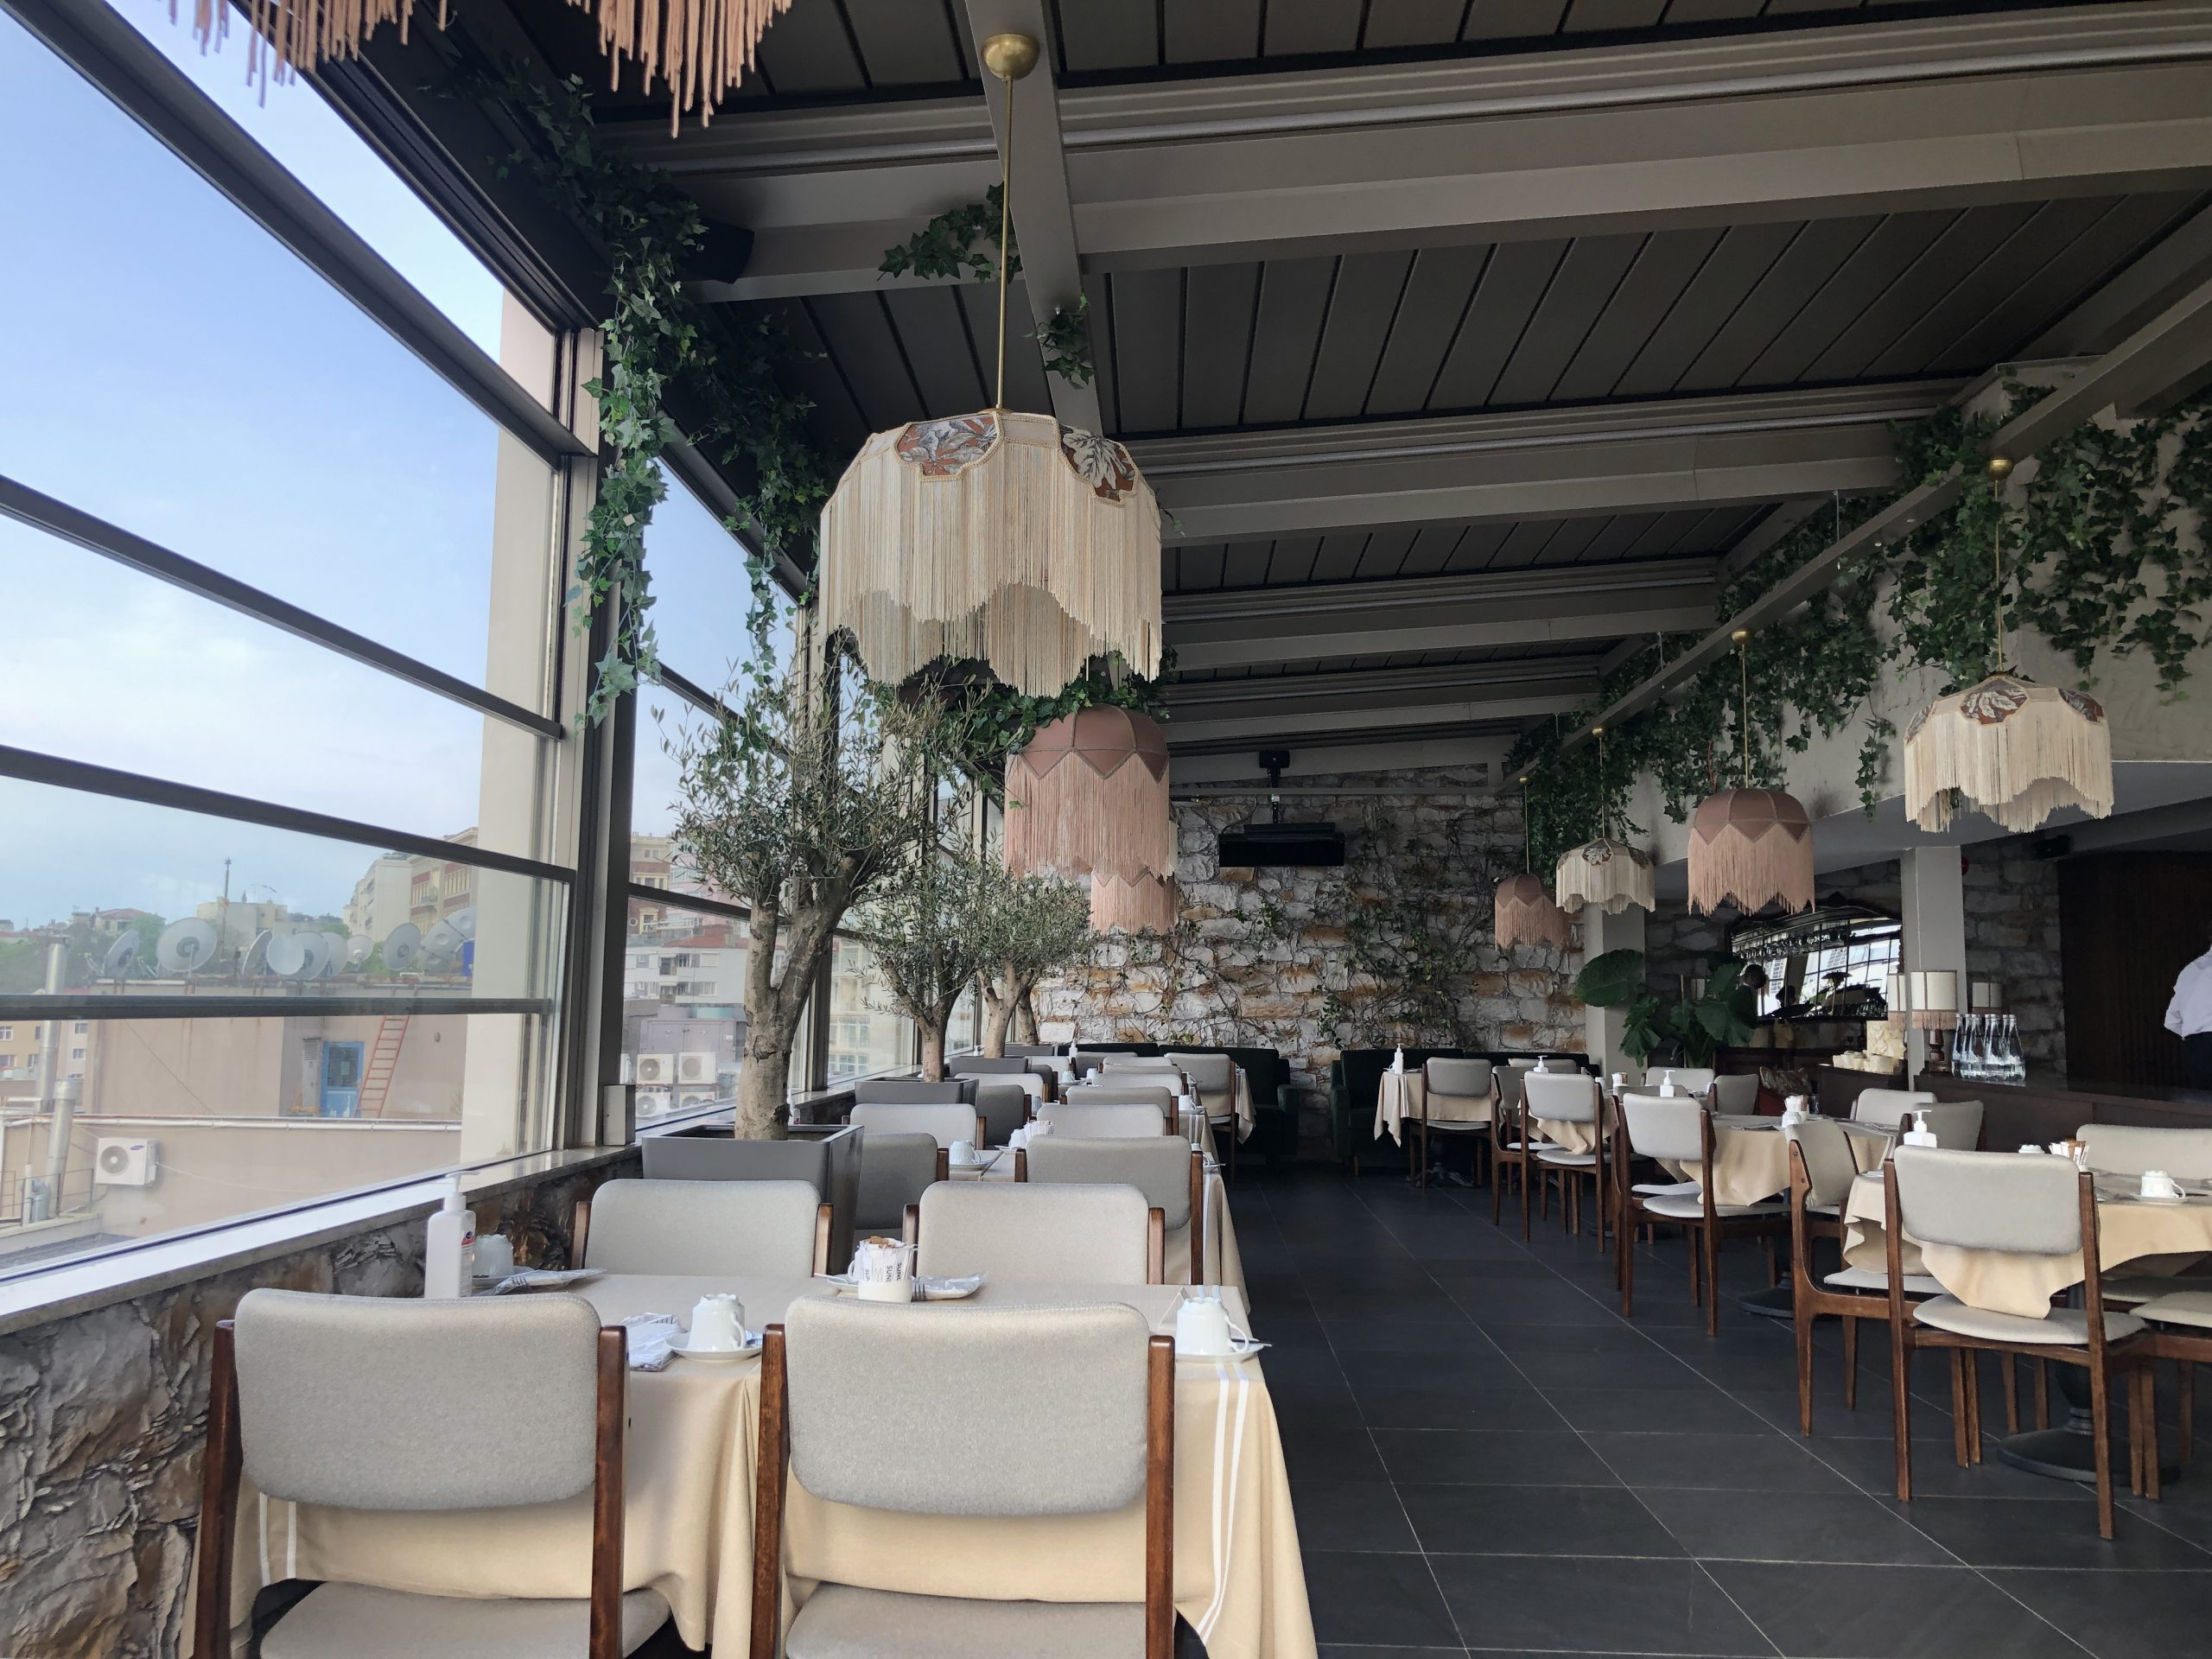 Hotel Review : アルチザンイスタンブール Mギャラリー ボスポラススイート(The Artisan Istanbul MGallery Bosphorus Suite Room)